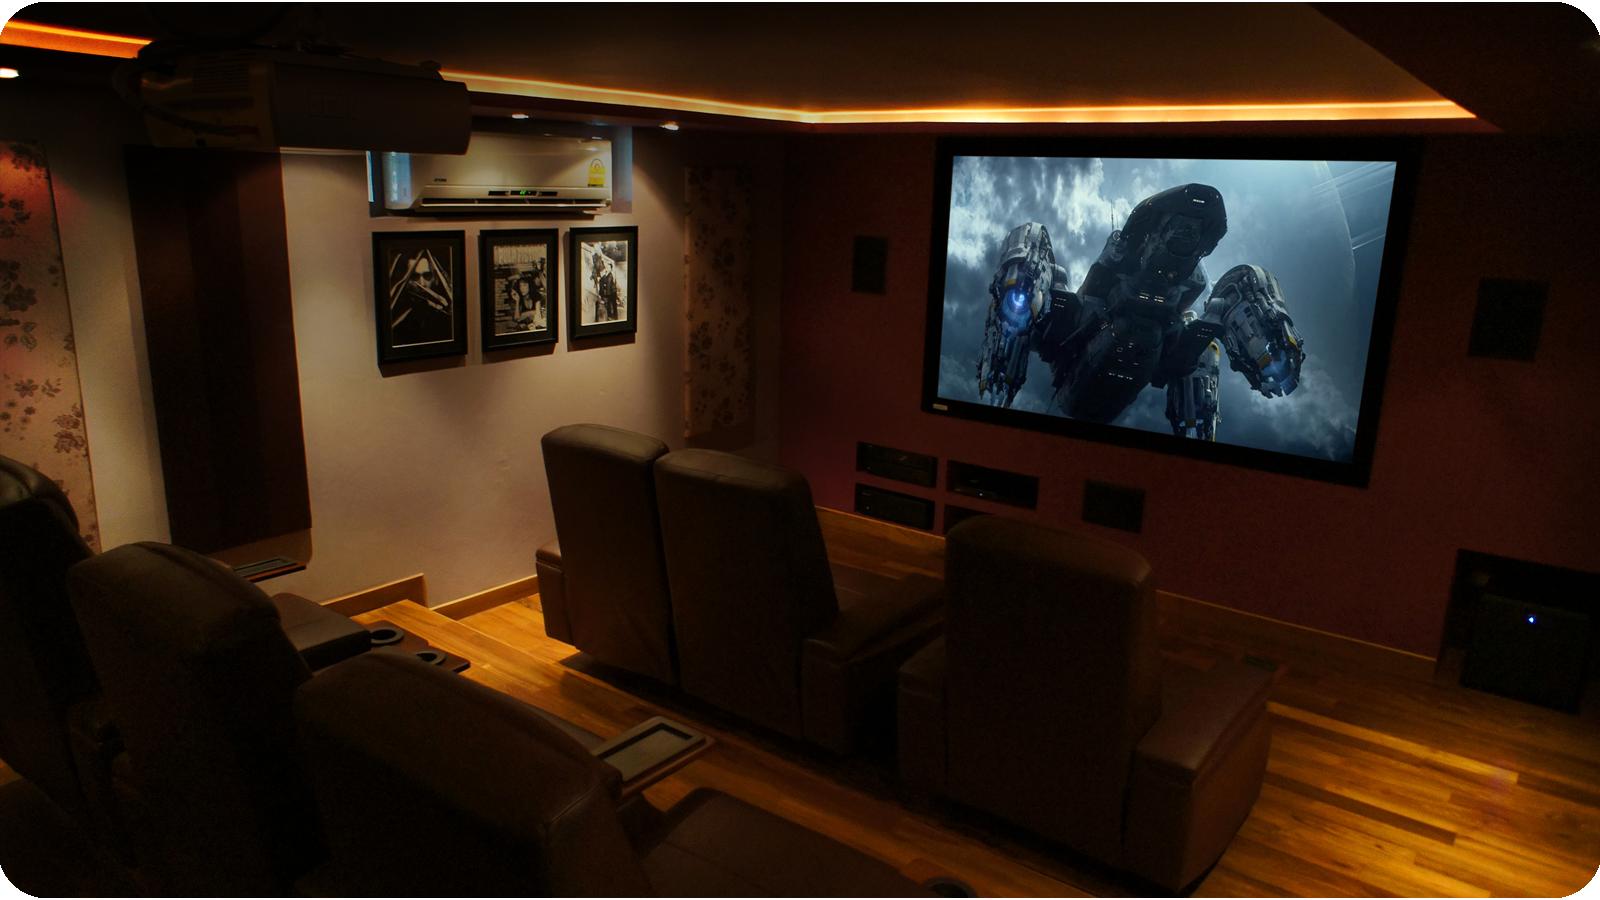 Home Cinema in Thailand 4